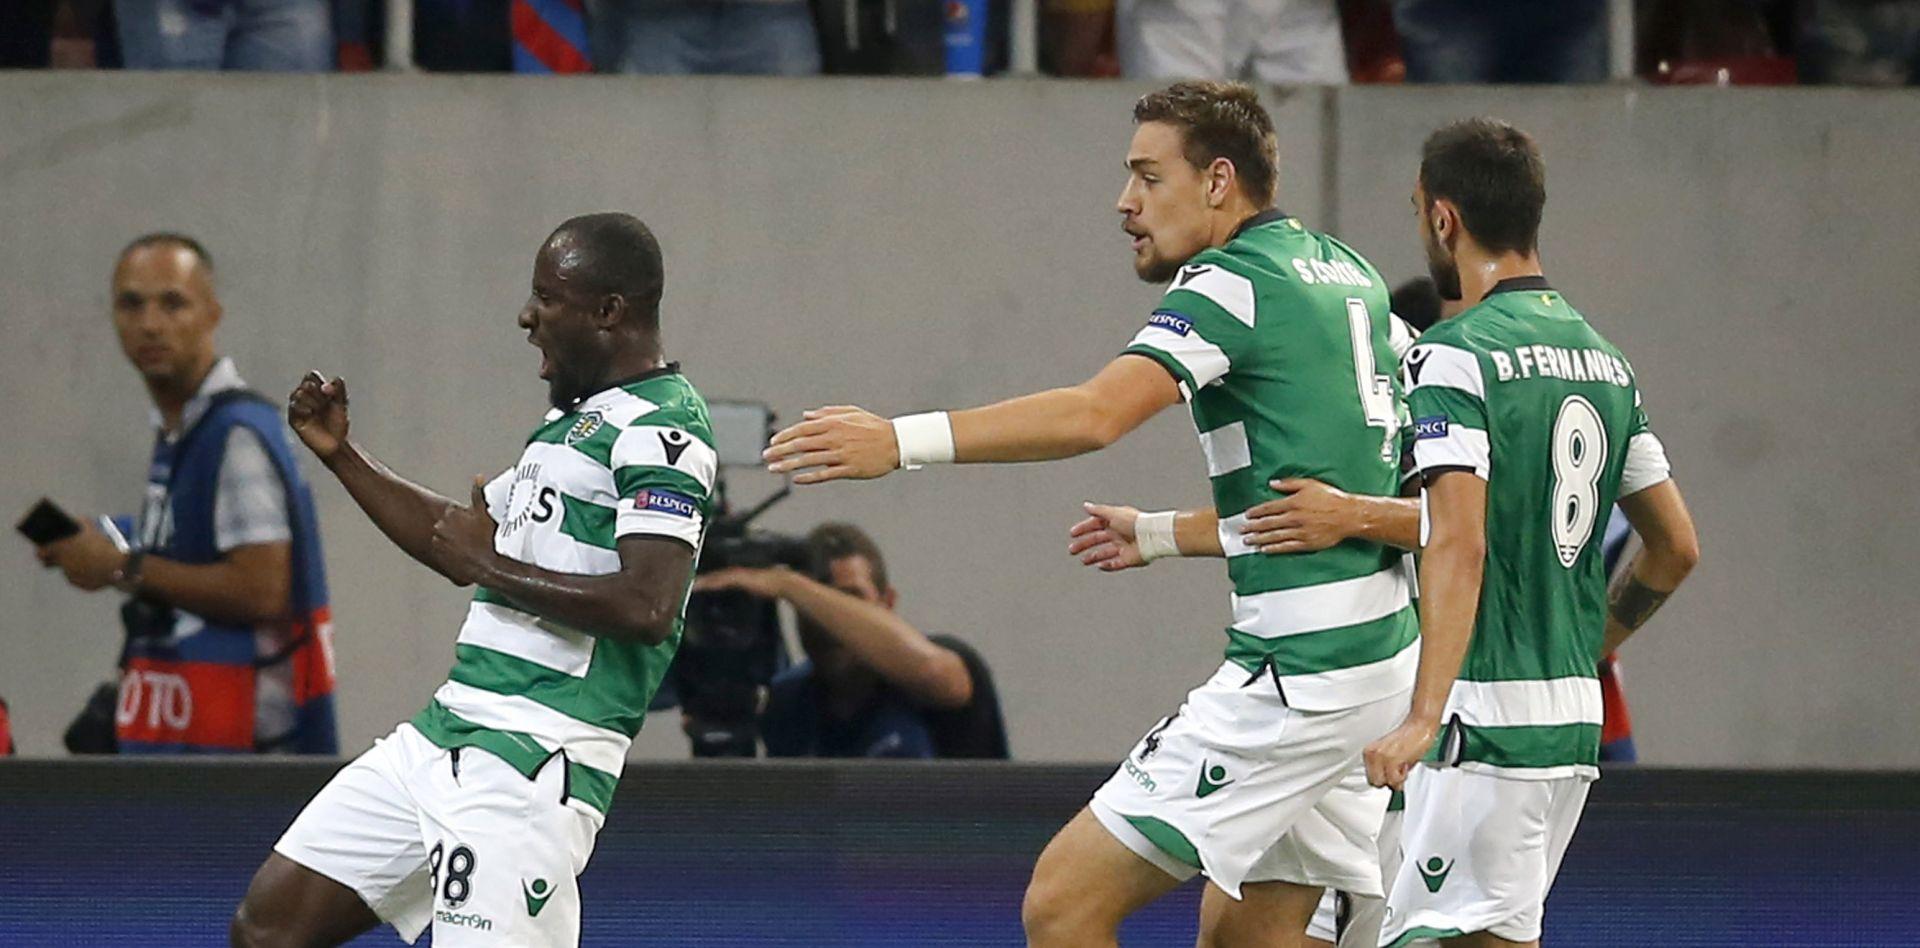 Liverpool, CSKA, Qarabağ, Sporting i APOEL izborili Ligu prvaka